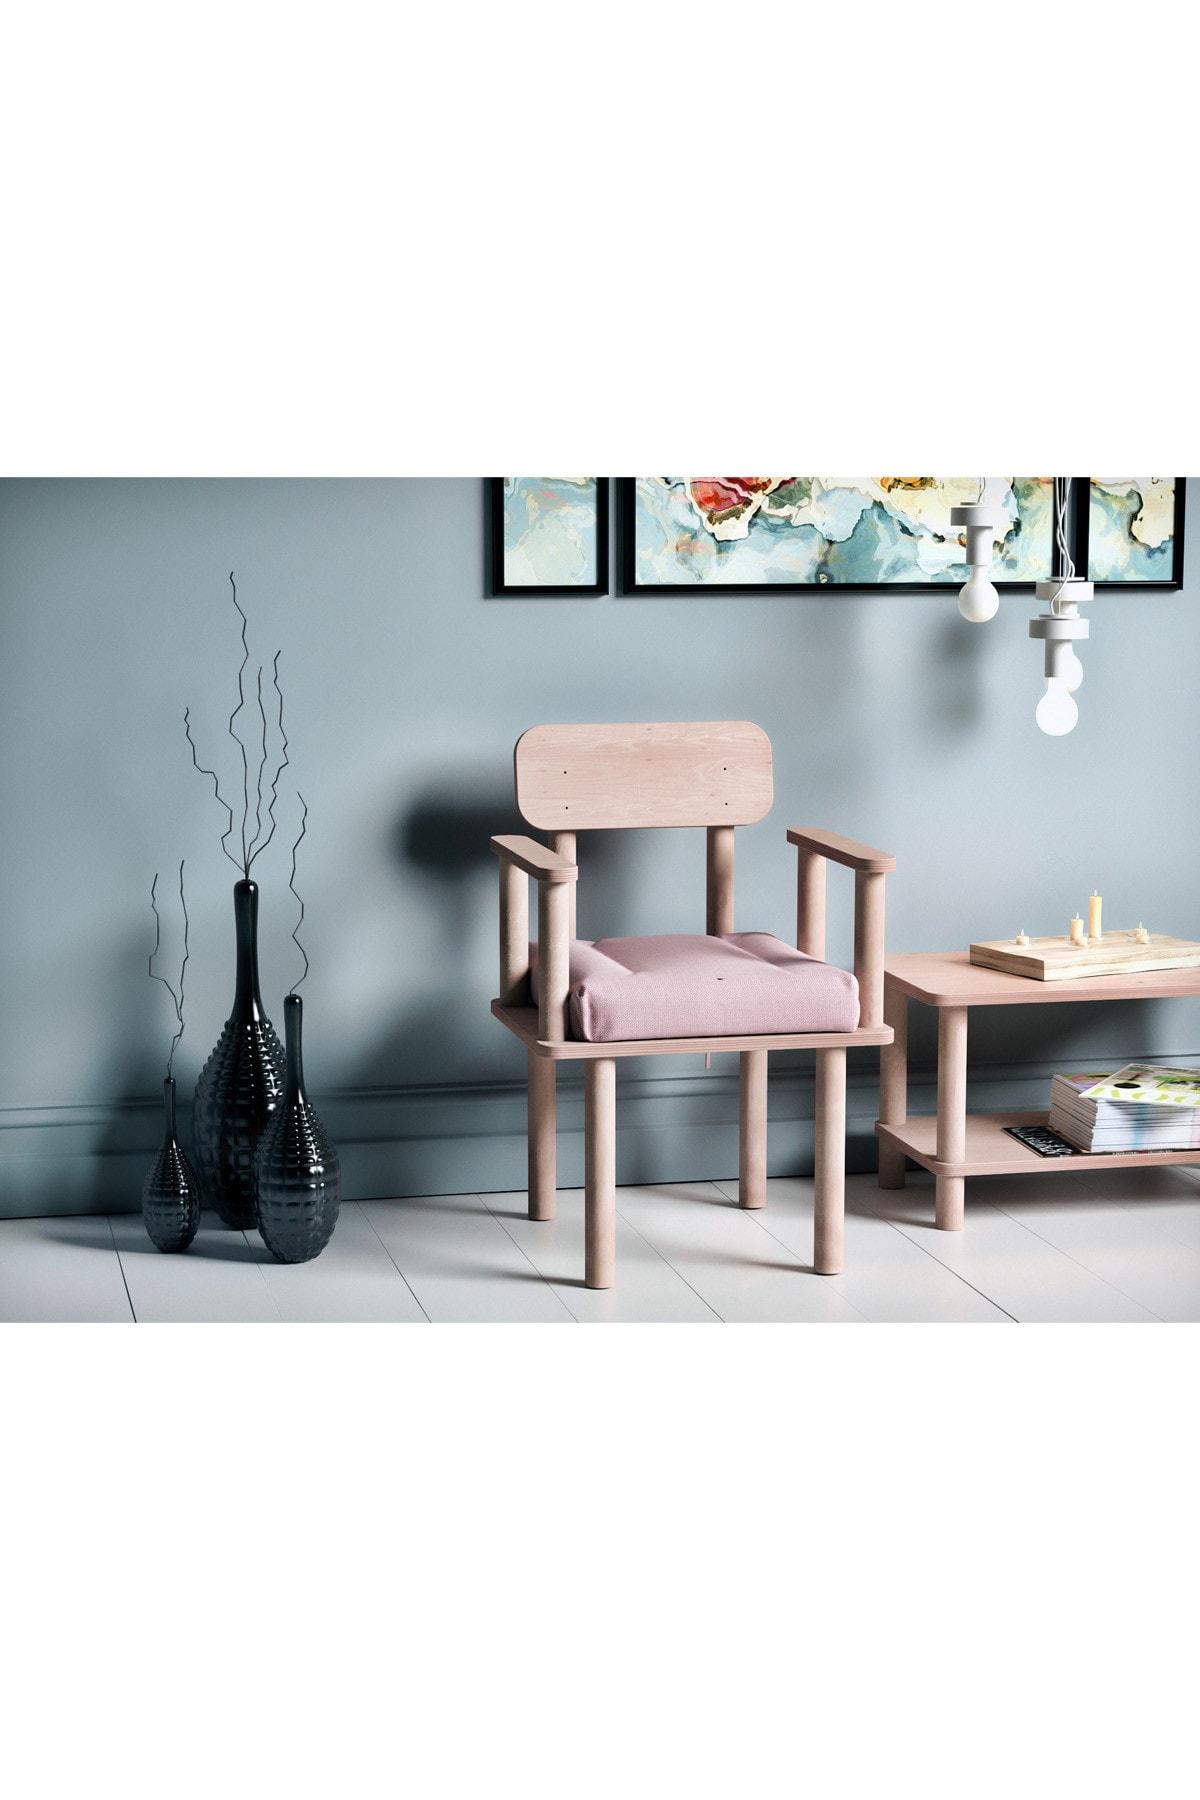 VUDIVA Magnesia Kolçaklı Sandalye Pembe